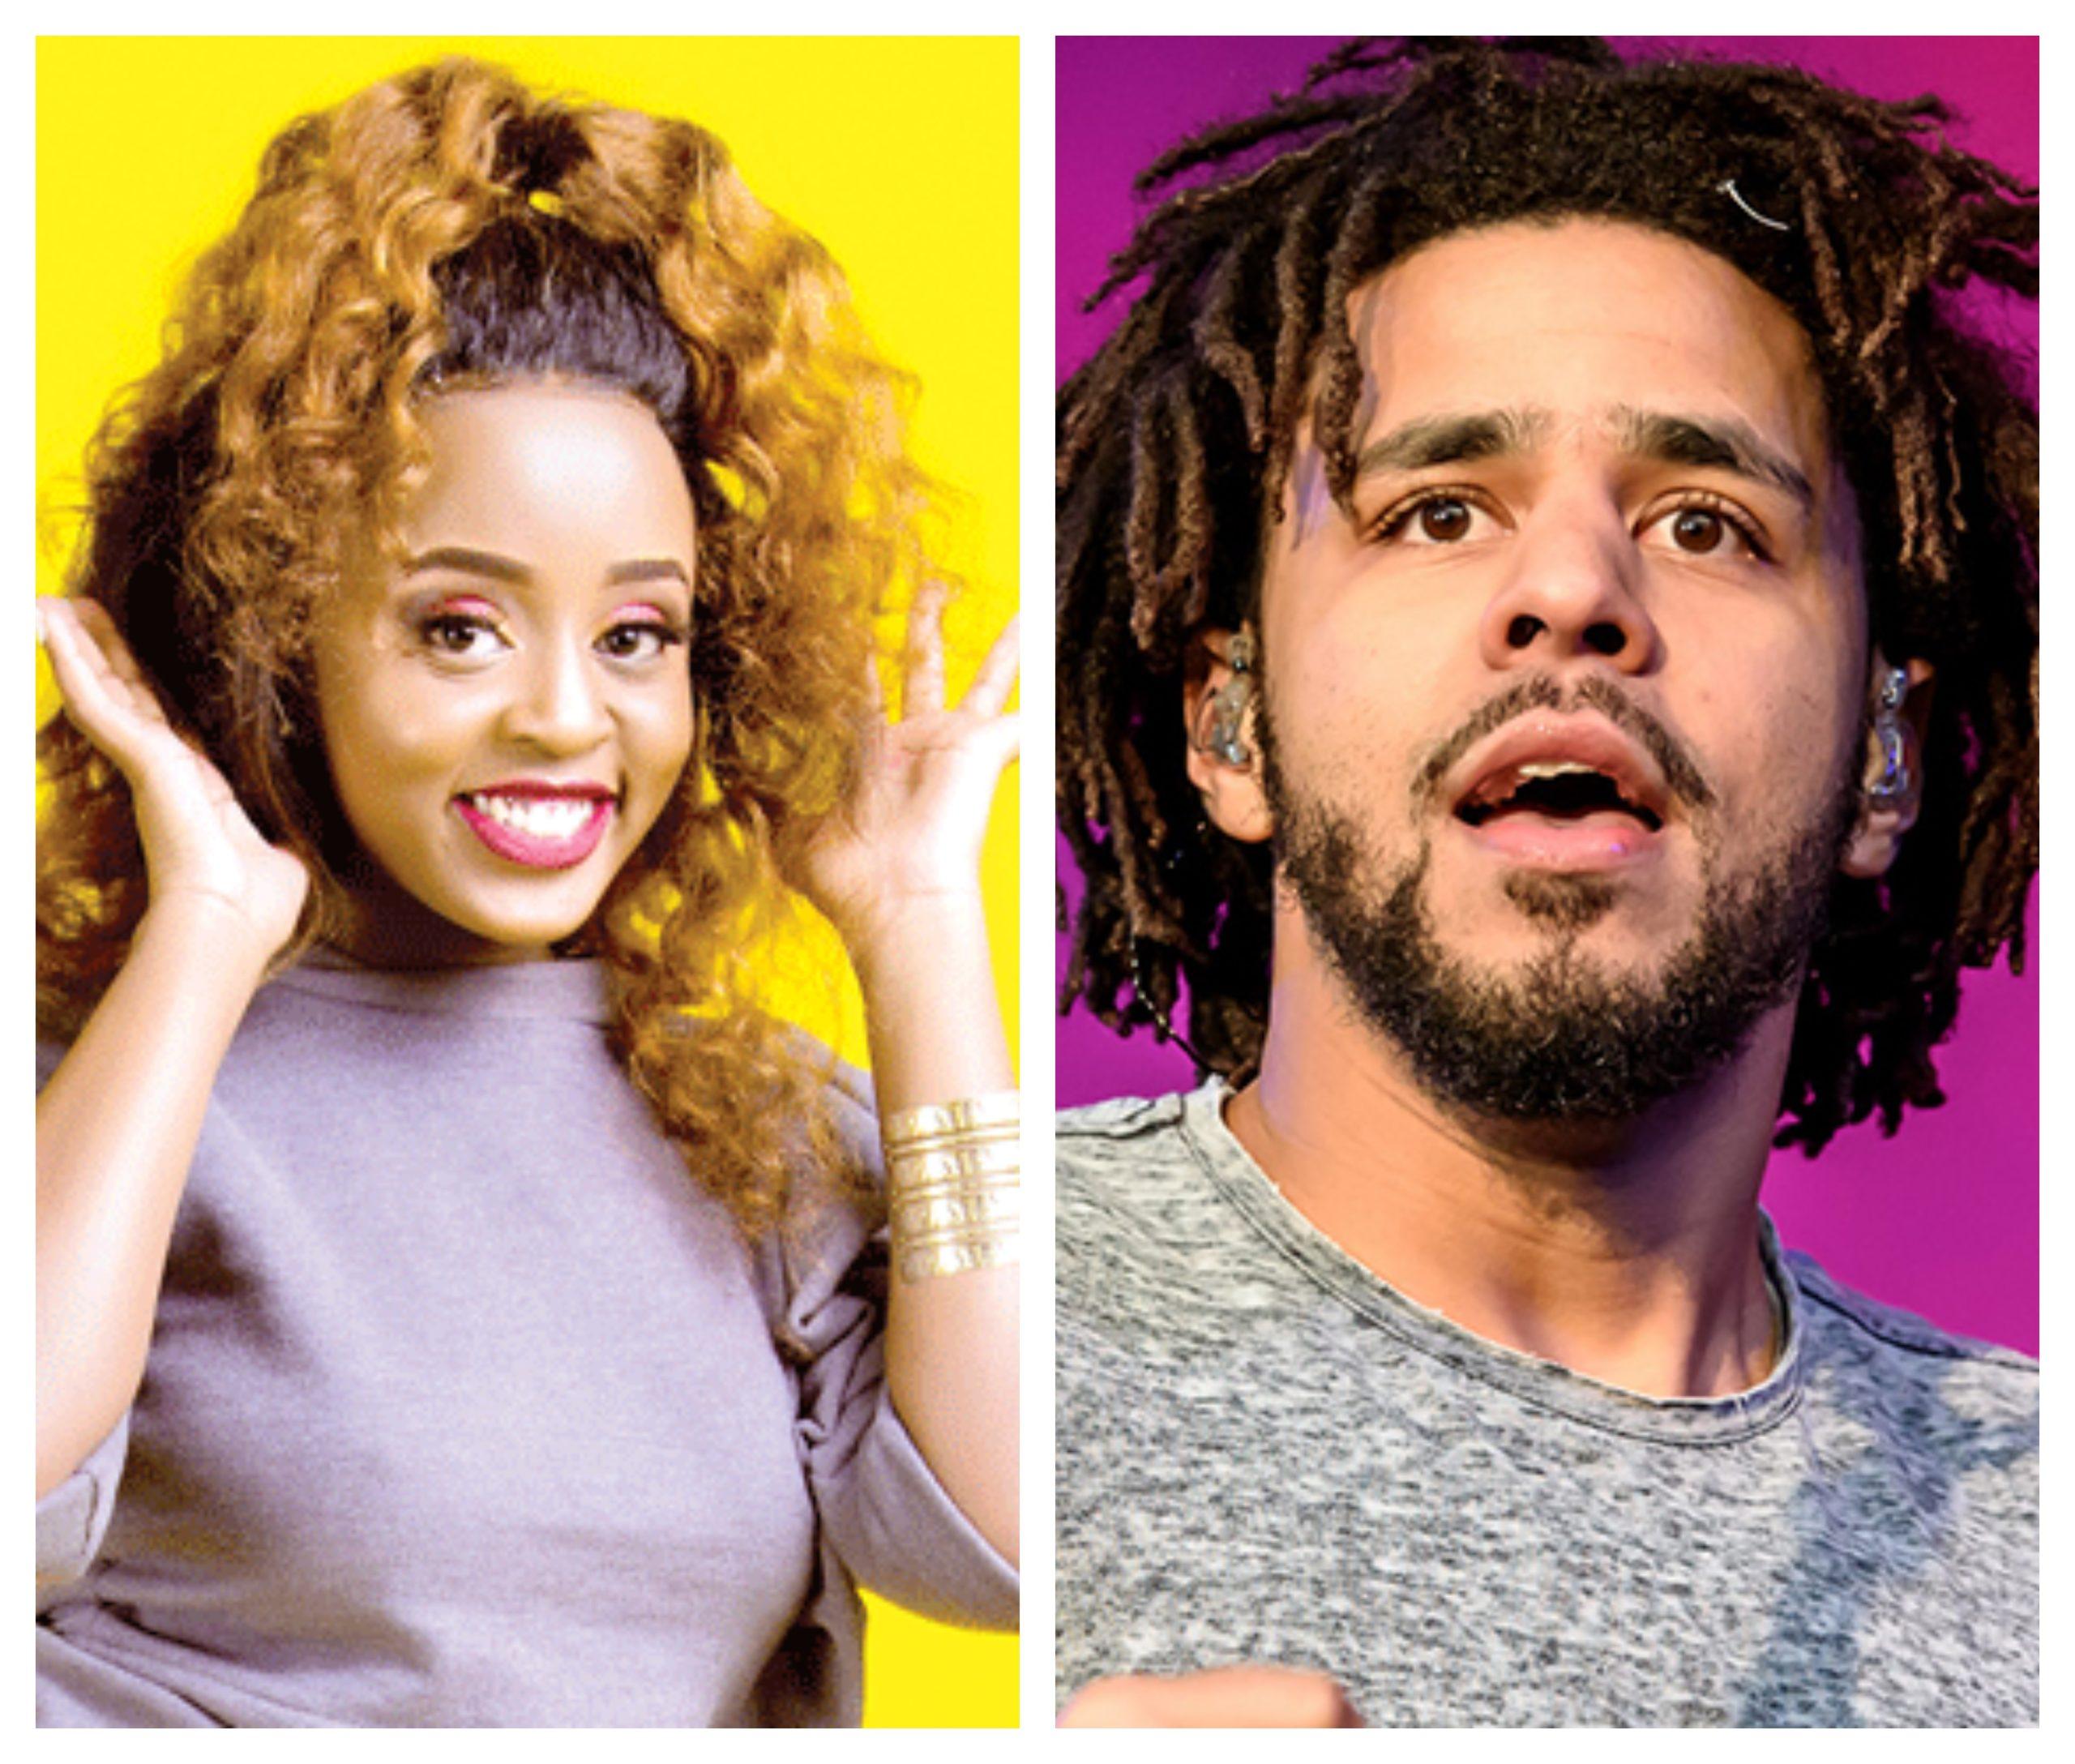 ¨The man who makes my ovaries shake...¨ Nadia Mukami goes gaga over American rapper, J Cole again